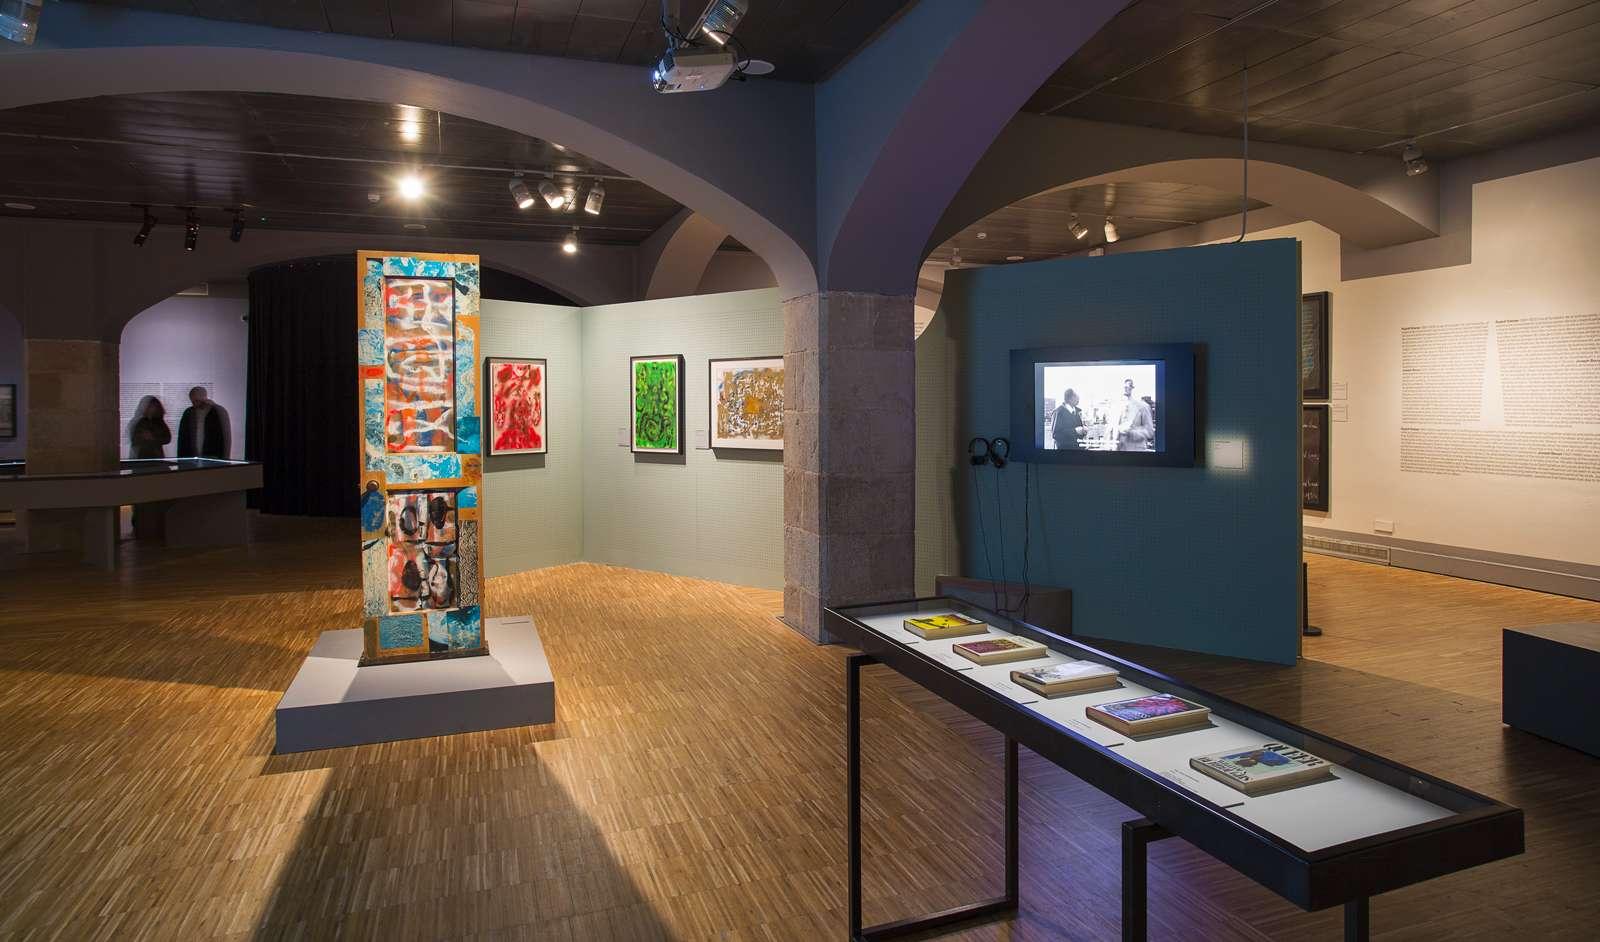 William S. Burroughs Black light - Secretive traditions in the Arts since the 1950s Centre of Contemporary Culture in Barcelona, Barcelone (ES) 15 mai  — 14 octobre 2018